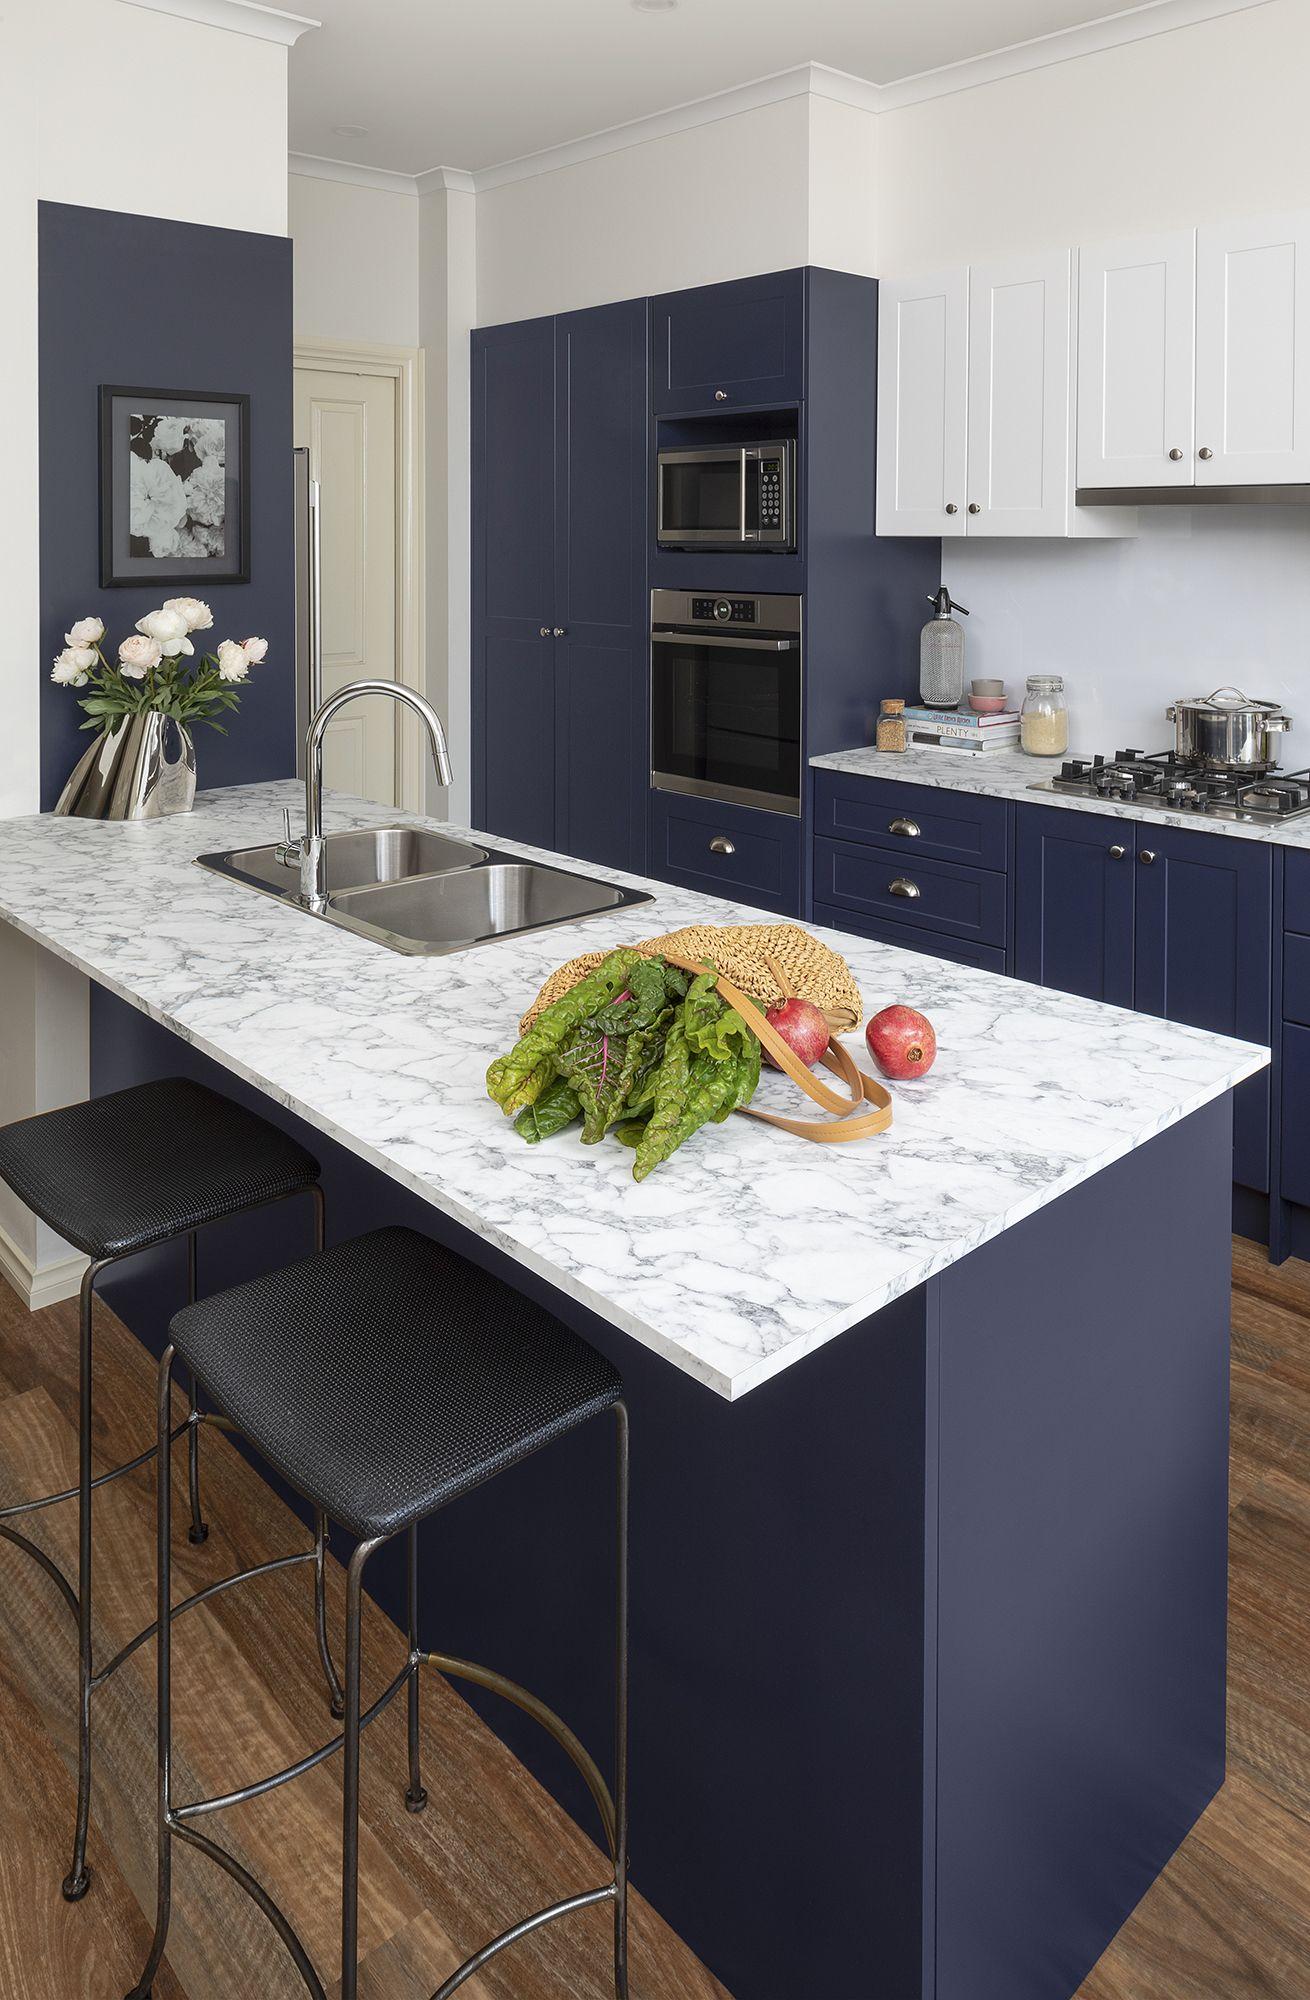 blue crush kitchen inspiration and ideas kaboodle kitchen in 2020 kitchen layout kitchen on kaboodle kitchen navy id=88801